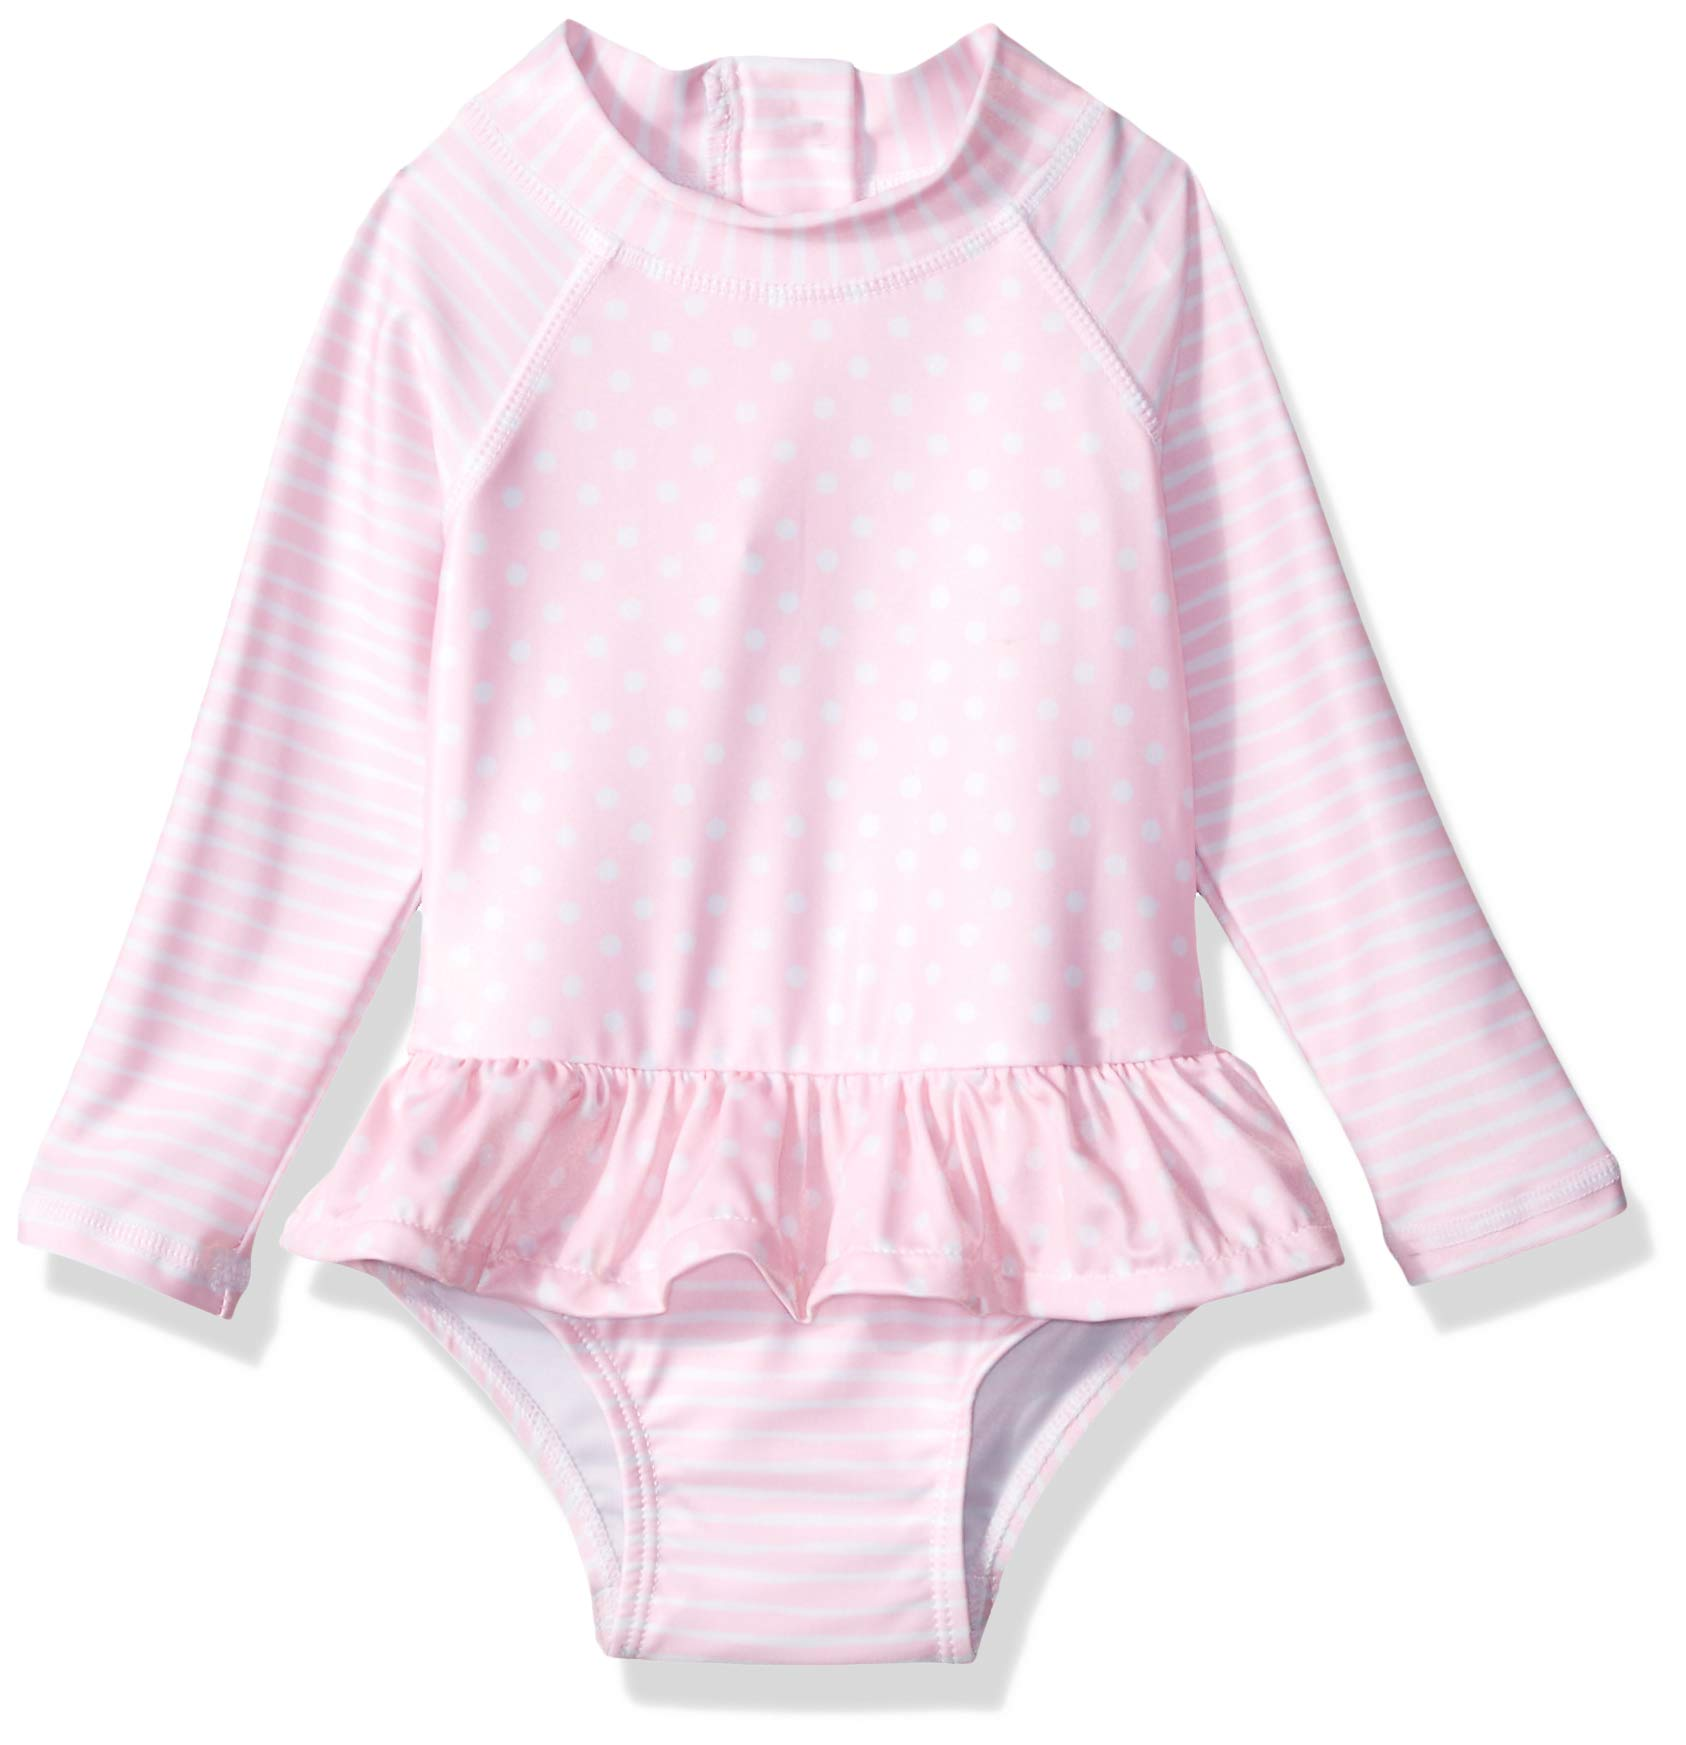 Flap Happy Baby Girls UPF 50+ Alissa Infant Rash Guard Swimsuit, Pink dot, 3M by Flap Happy